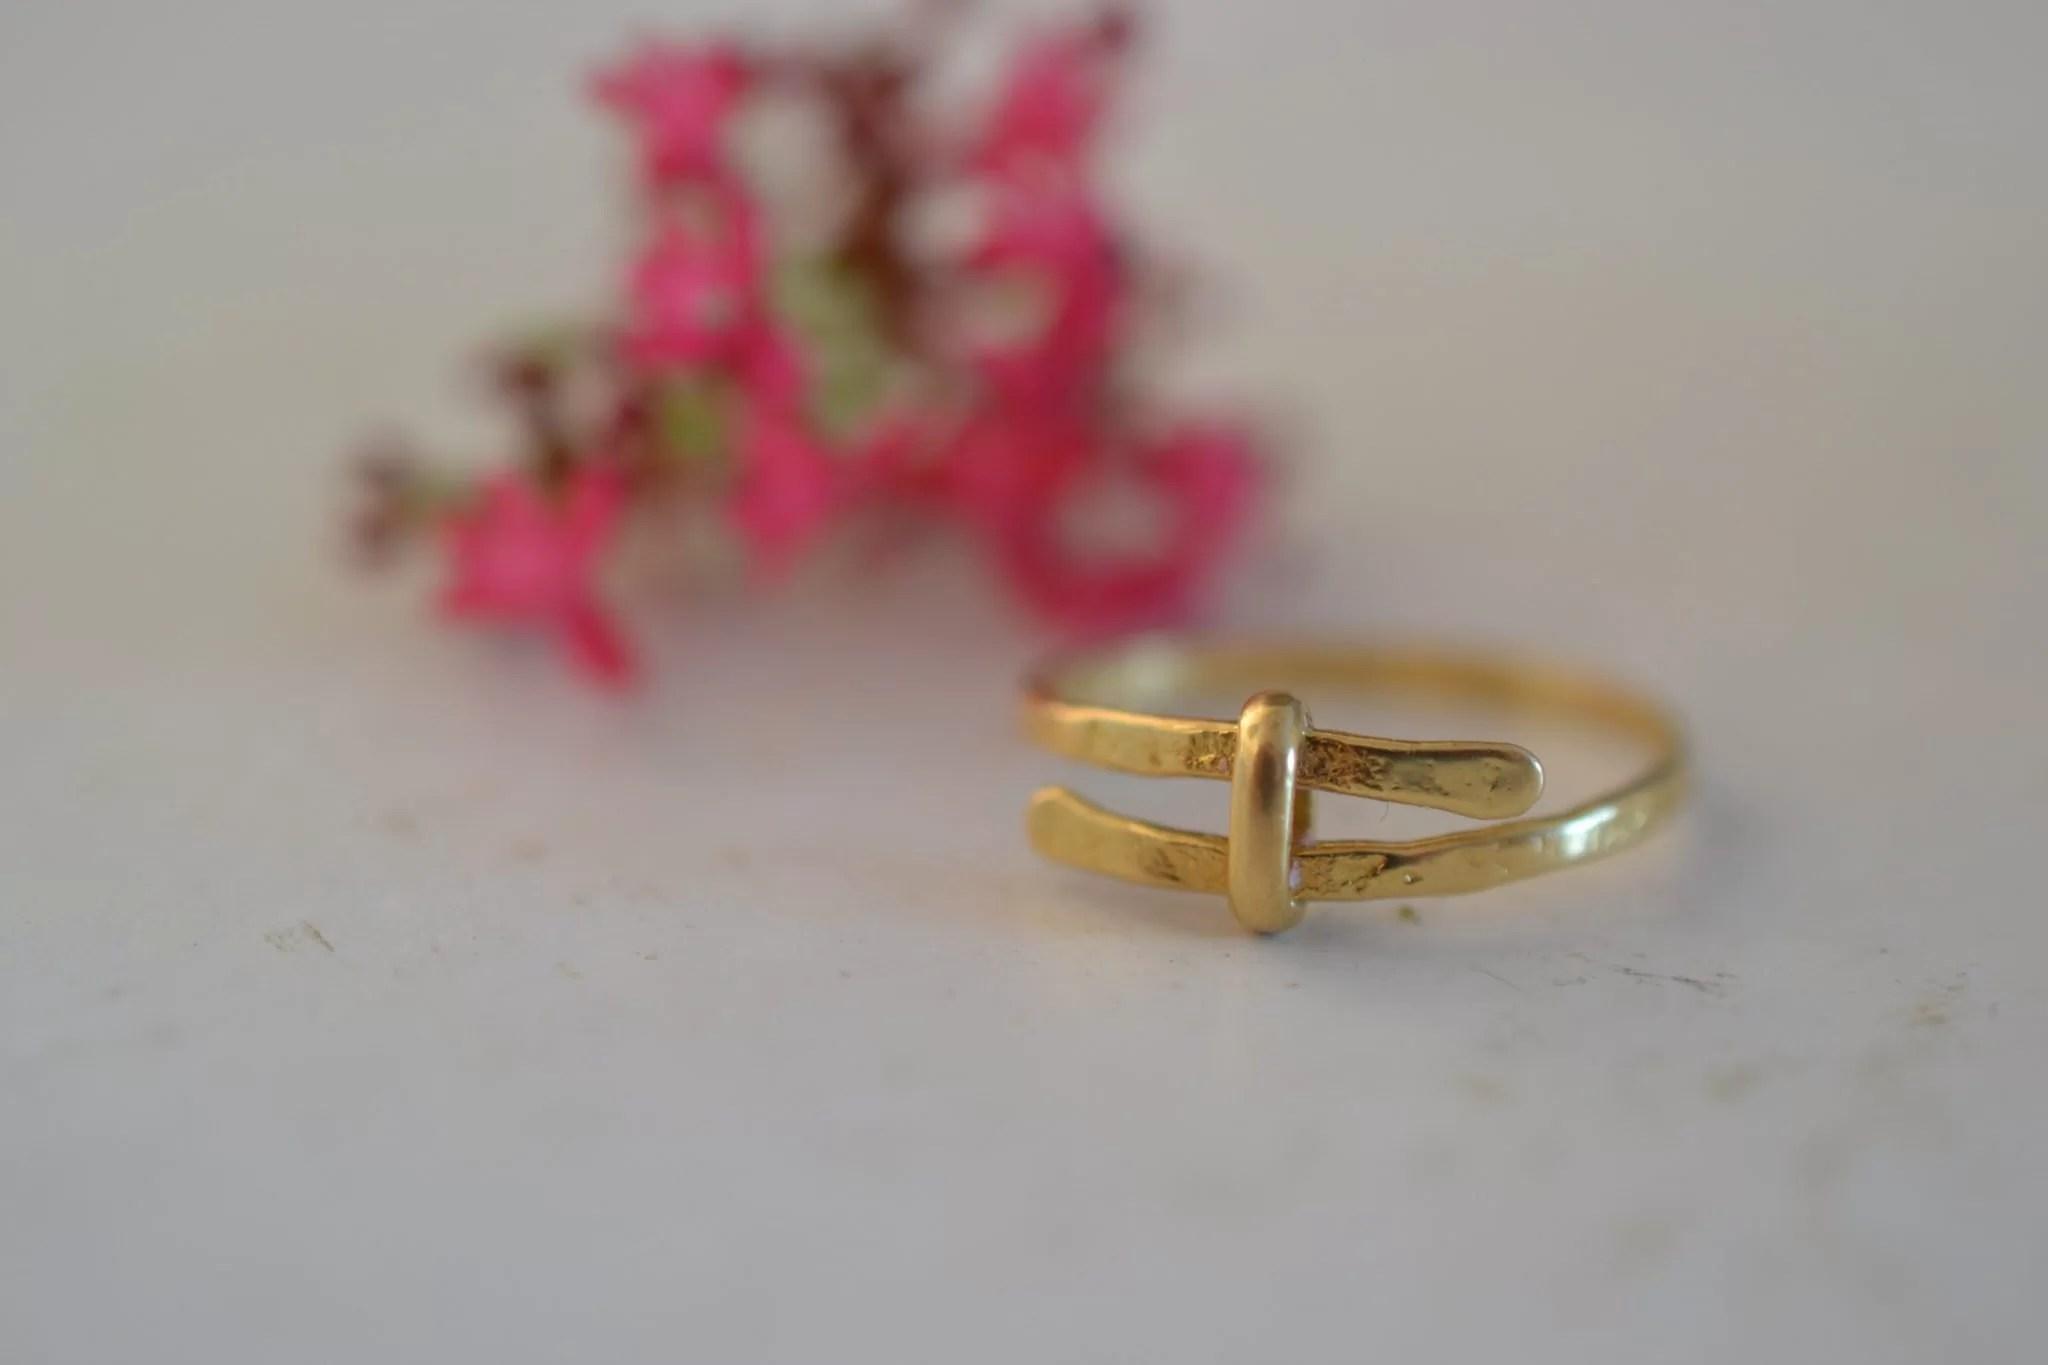 bague martlée en or - Bijou vintage certifé - 18 carats 750:1000 - bijoux seconde main